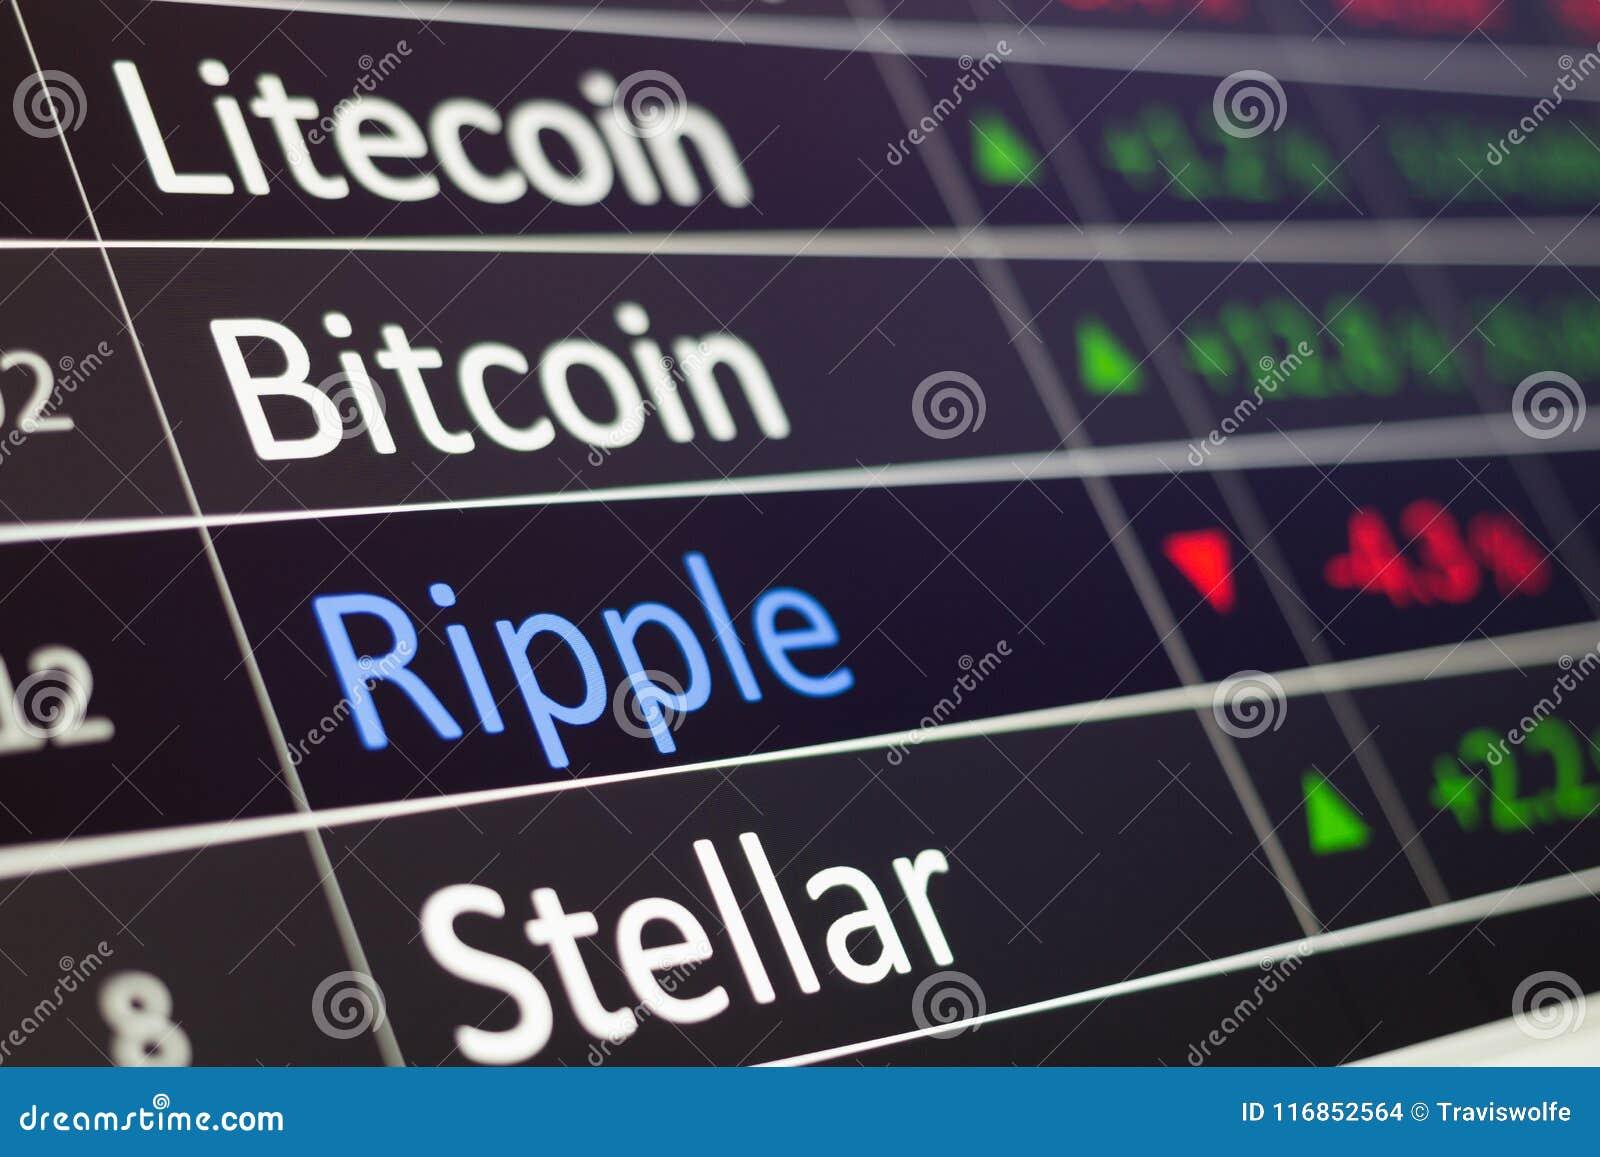 stellar trading cryptocurrency